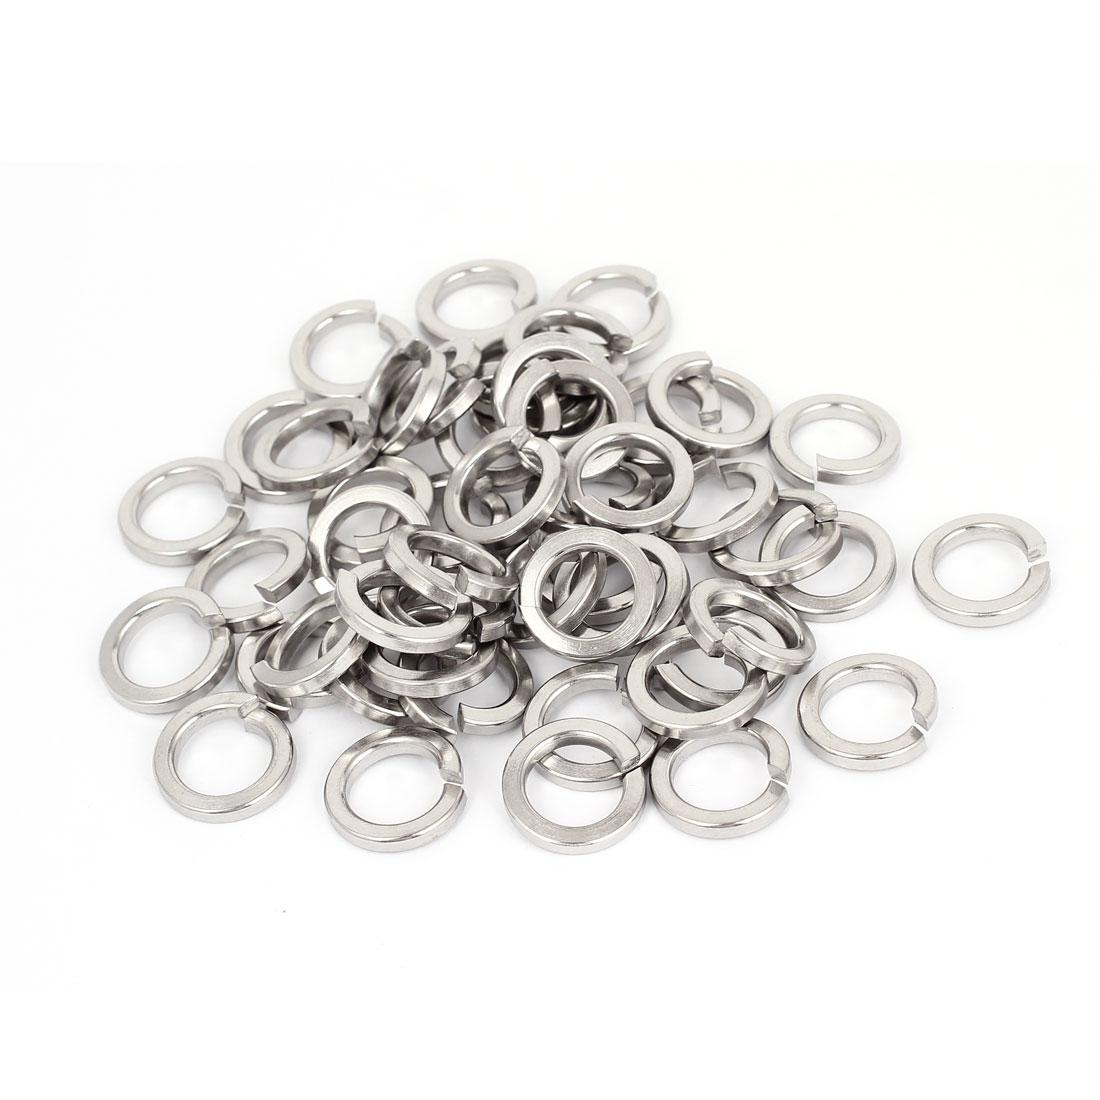 50pcs 304 Stainless Steel Split Lock Spring Washers M16 Screw Gasket Pad